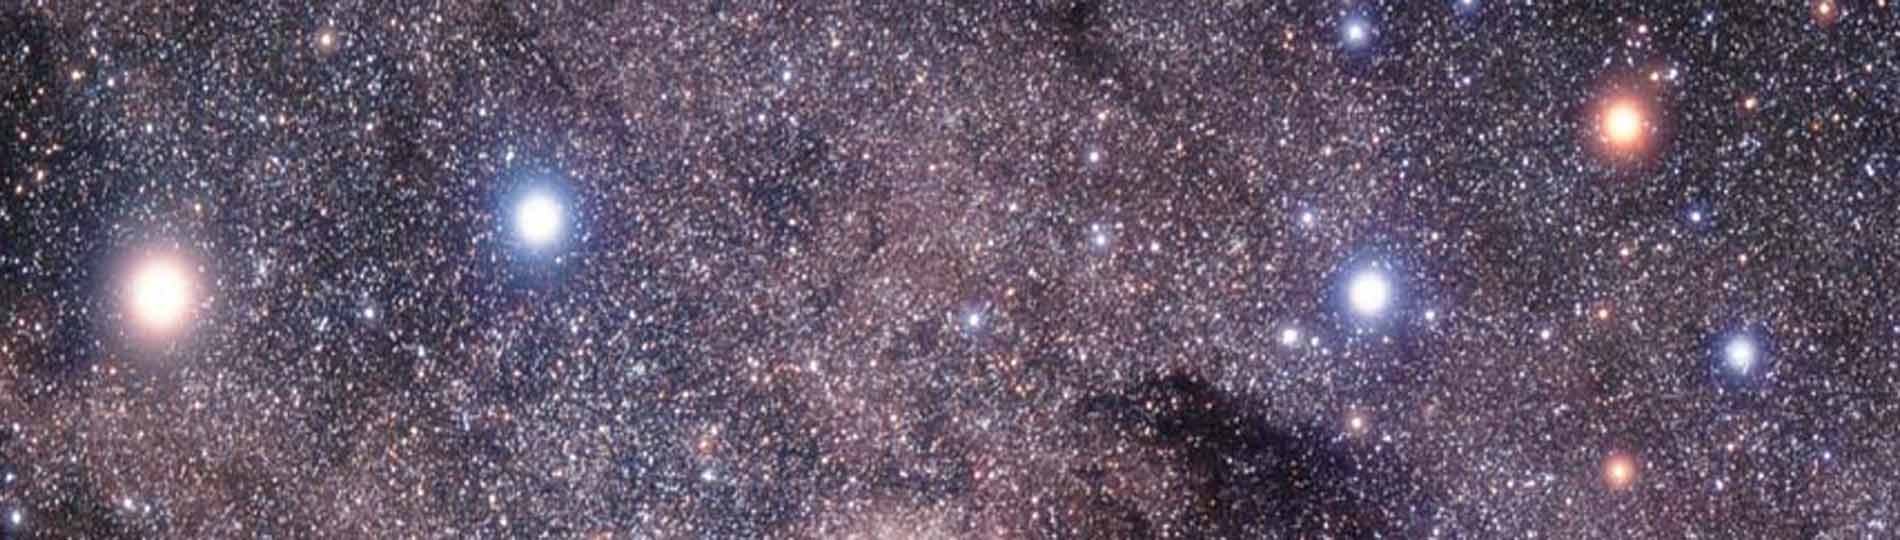 Immortal interstellar probes